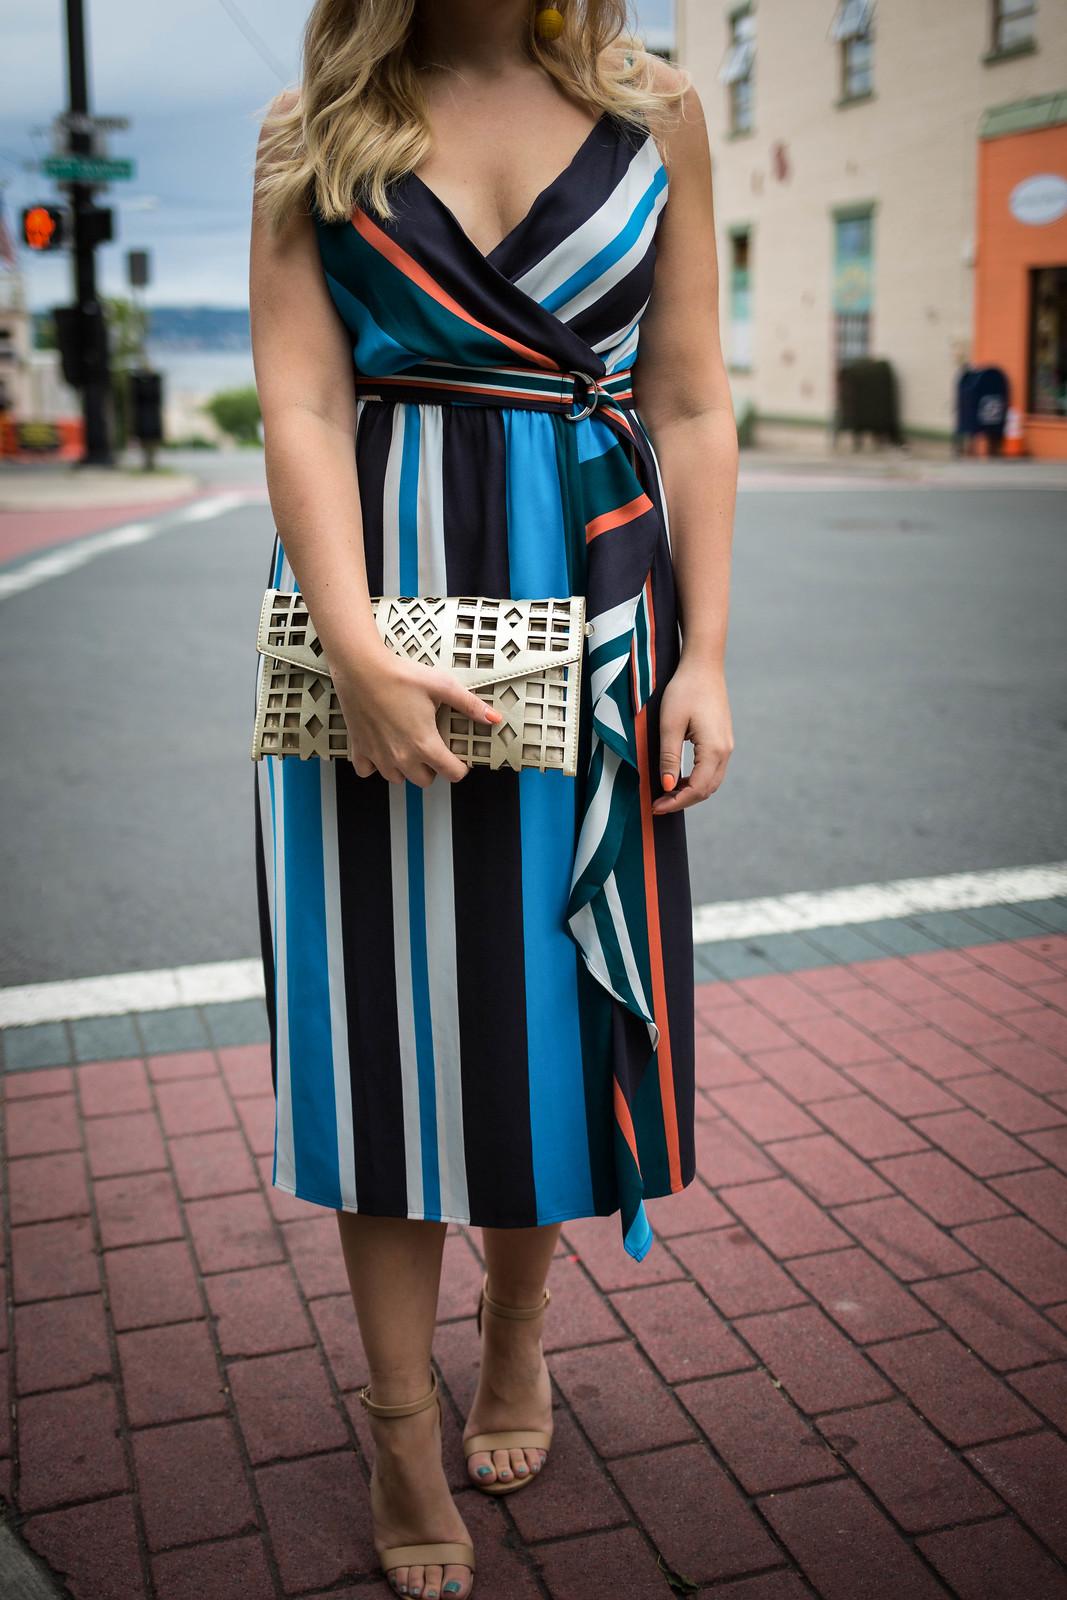 Blue Stripe Midi Dress   Fall Wedding Outfit Inspiration   Wedding Attire